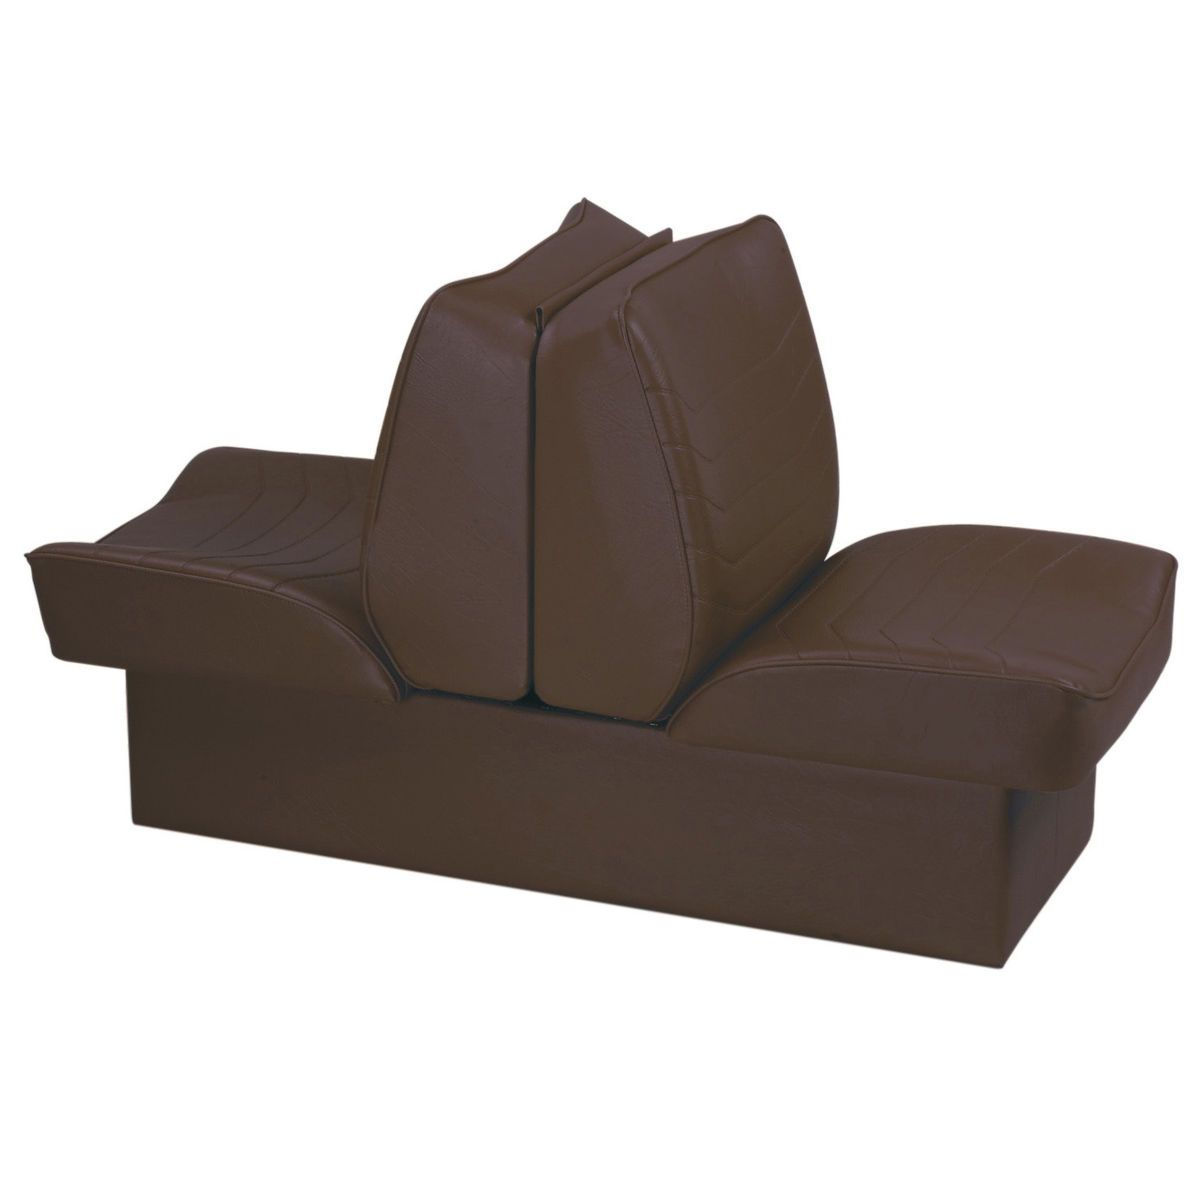 Strange Overtons Standard Small Craft Back To Back Lounge Seat Creativecarmelina Interior Chair Design Creativecarmelinacom